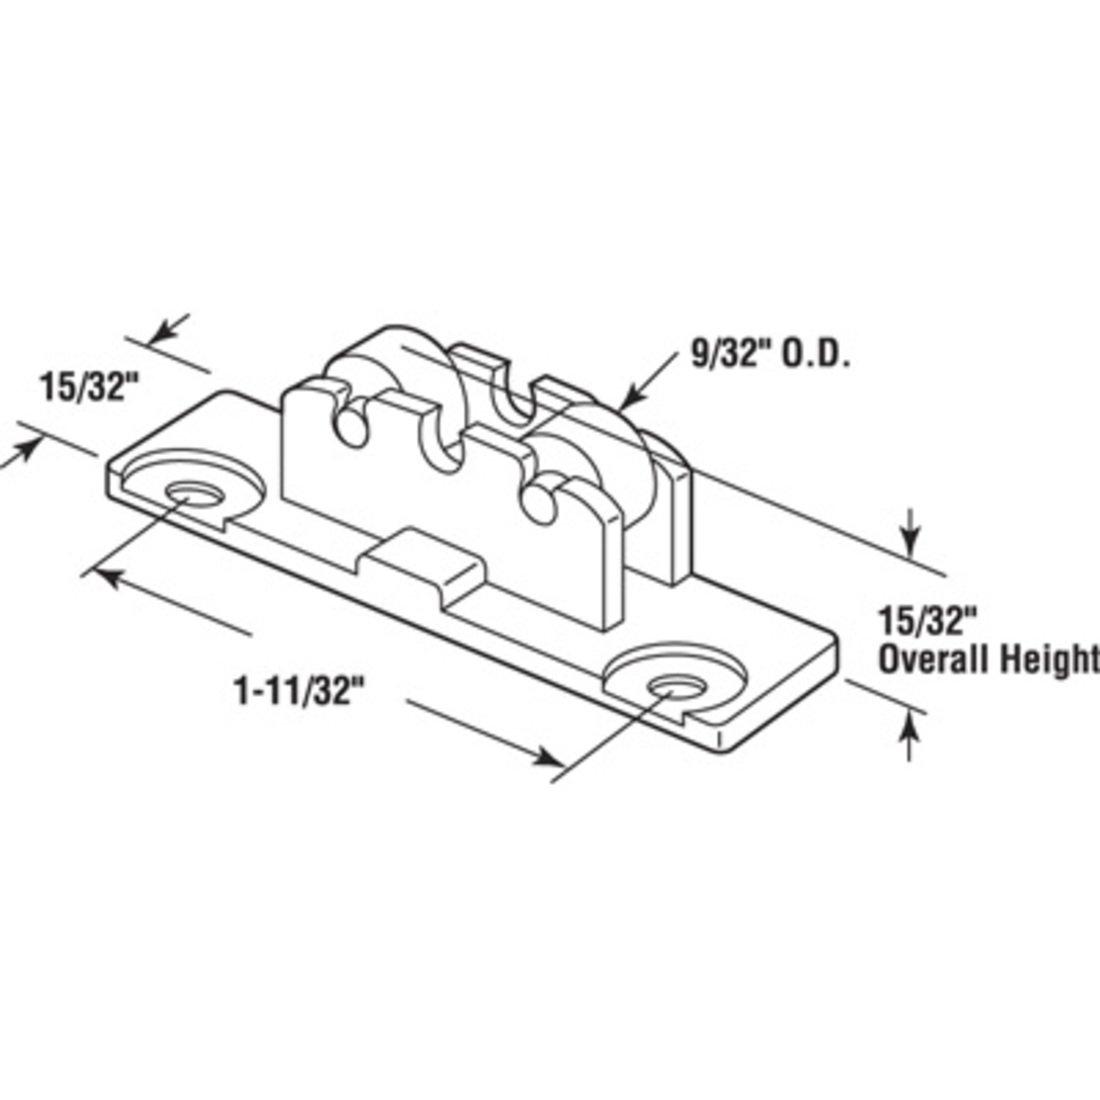 Tandem Flat Edge Window Roller Assembly 9//32 Daimeter Steel Wheel for Horizon Windows LAURENCE G3165 Package 9//32 Daimeter Steel Wheel for Horizon Windows C.R